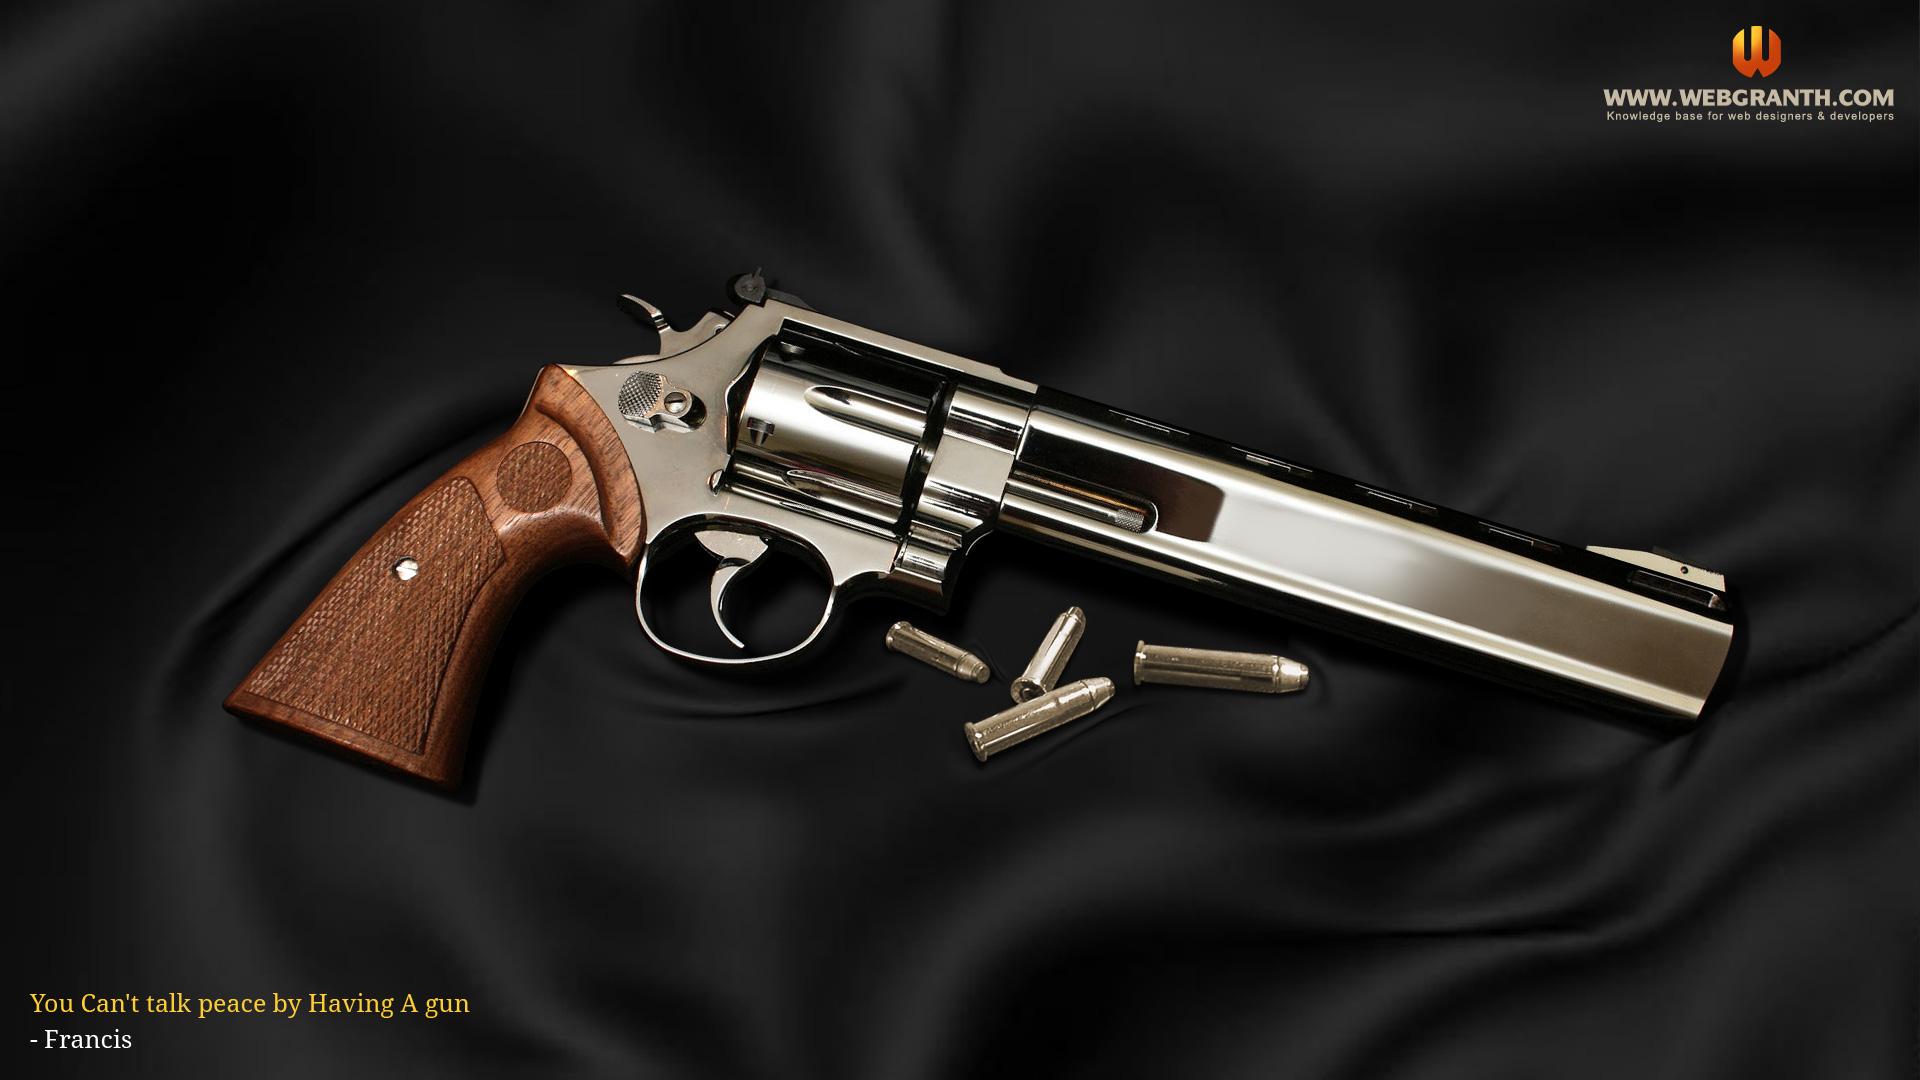 HD Guns Wallpaper Download HD Guns Weapons Wallpapers   Webgranth 1920x1080